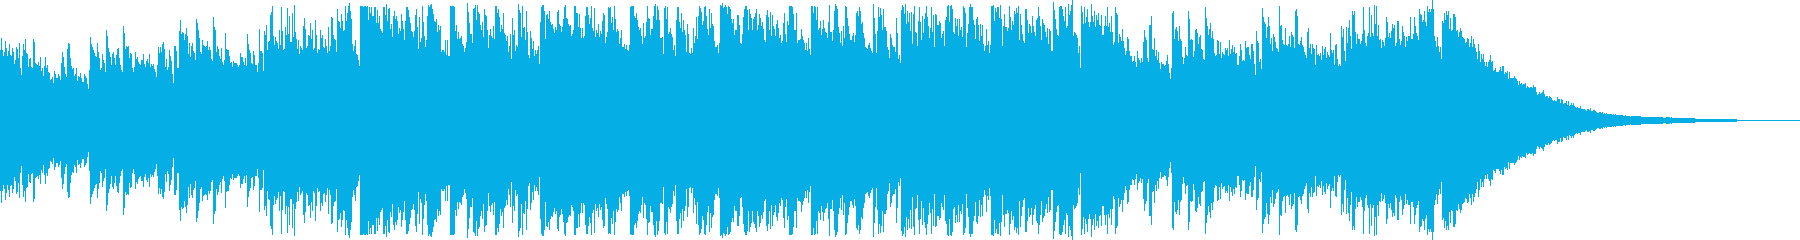 CM・エキサイティングな和風曲の再生済みの波形